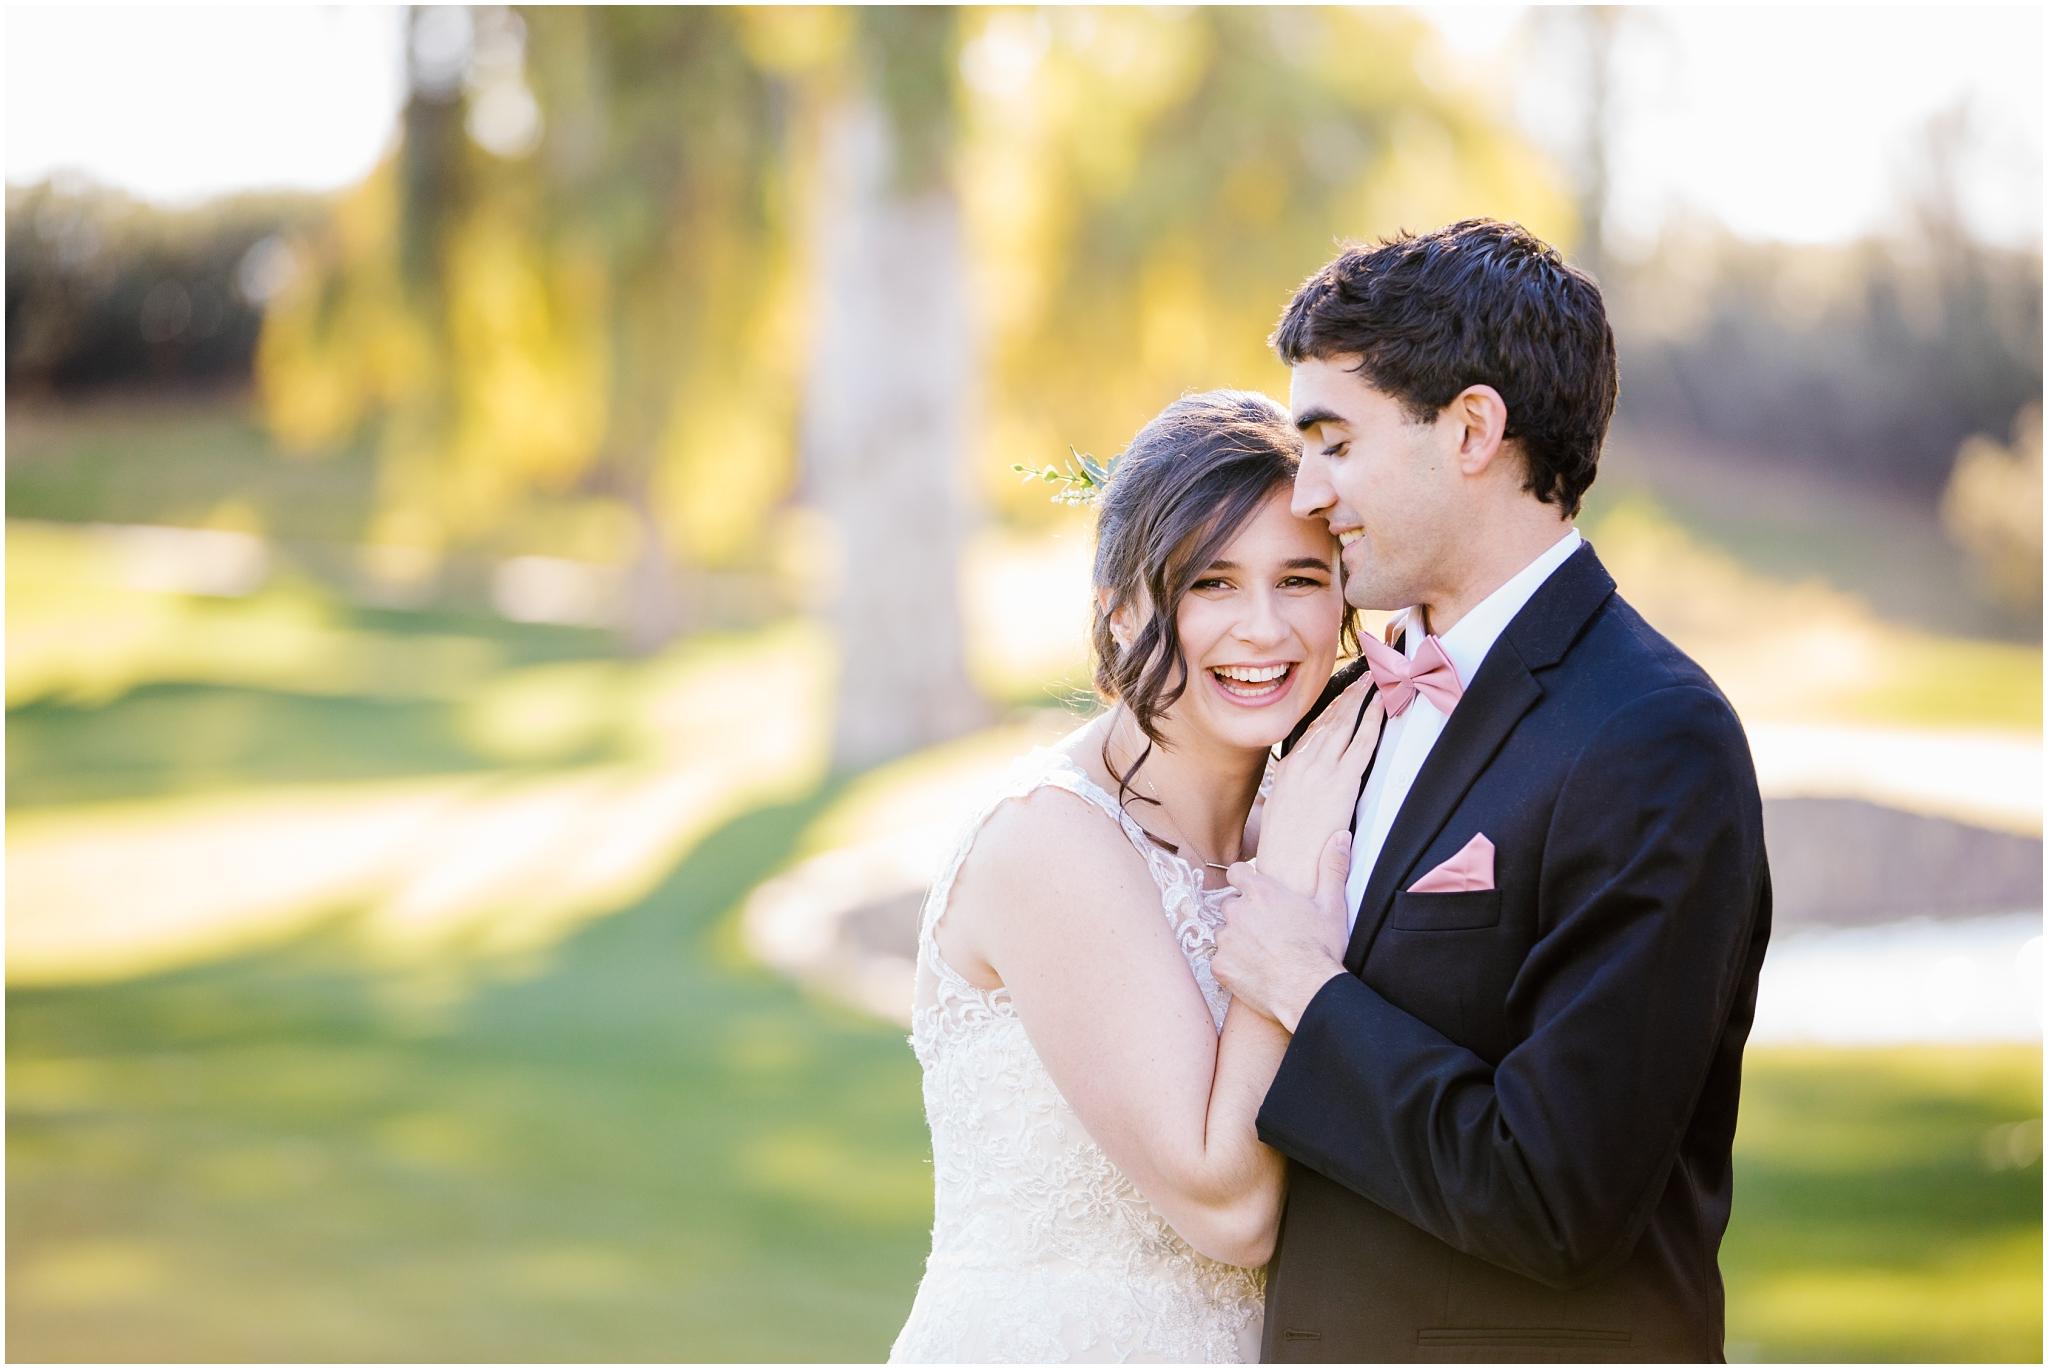 Marissa Nathan-5print_Lizzie-B-Imagery-Arizona-Wedding-Photographer-Salt-Lake-City-Temple-Park-City-Phoenix-Mesa-County-Club.jpg